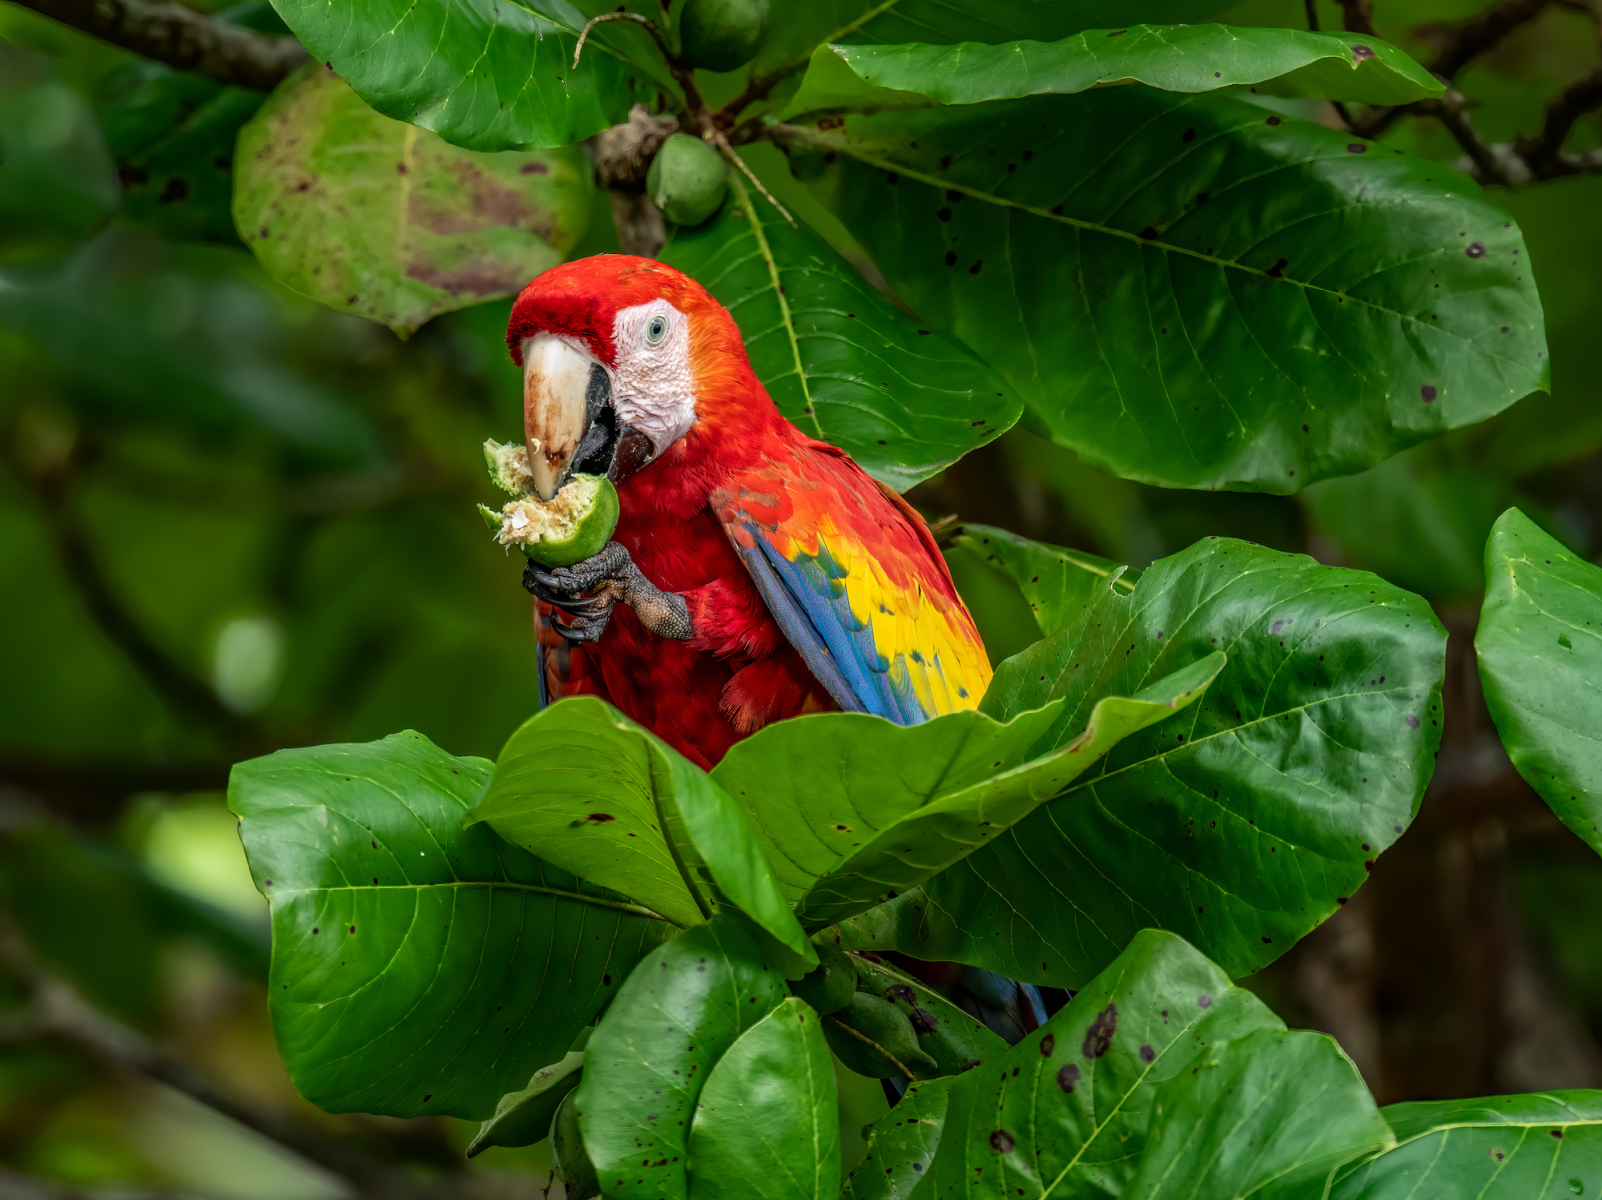 Scarlet Macaw by Cookie Segelstein